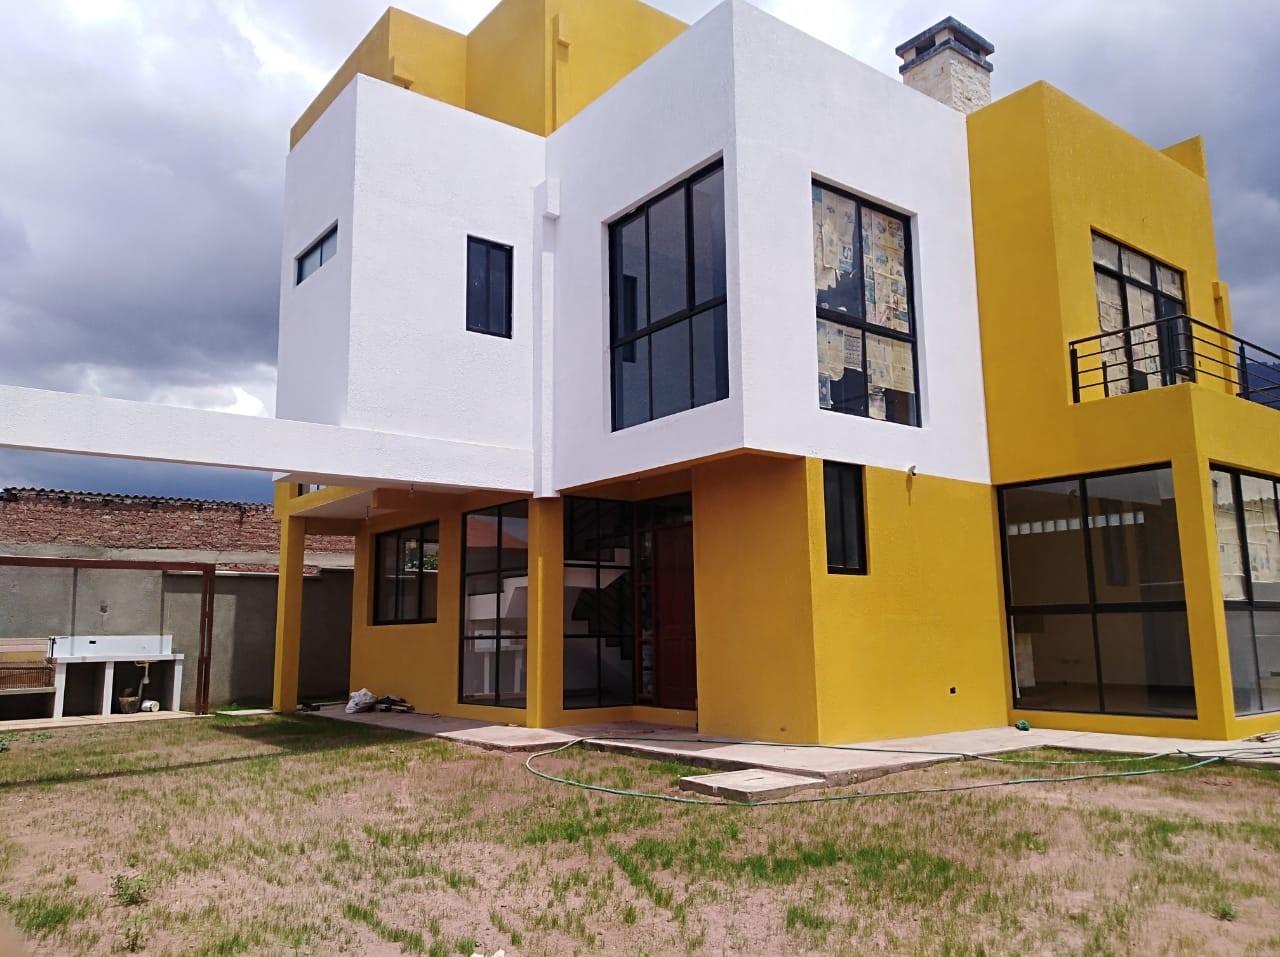 Casa en Venta C. Innominada esq. Av. Aguas Potables Foto 1